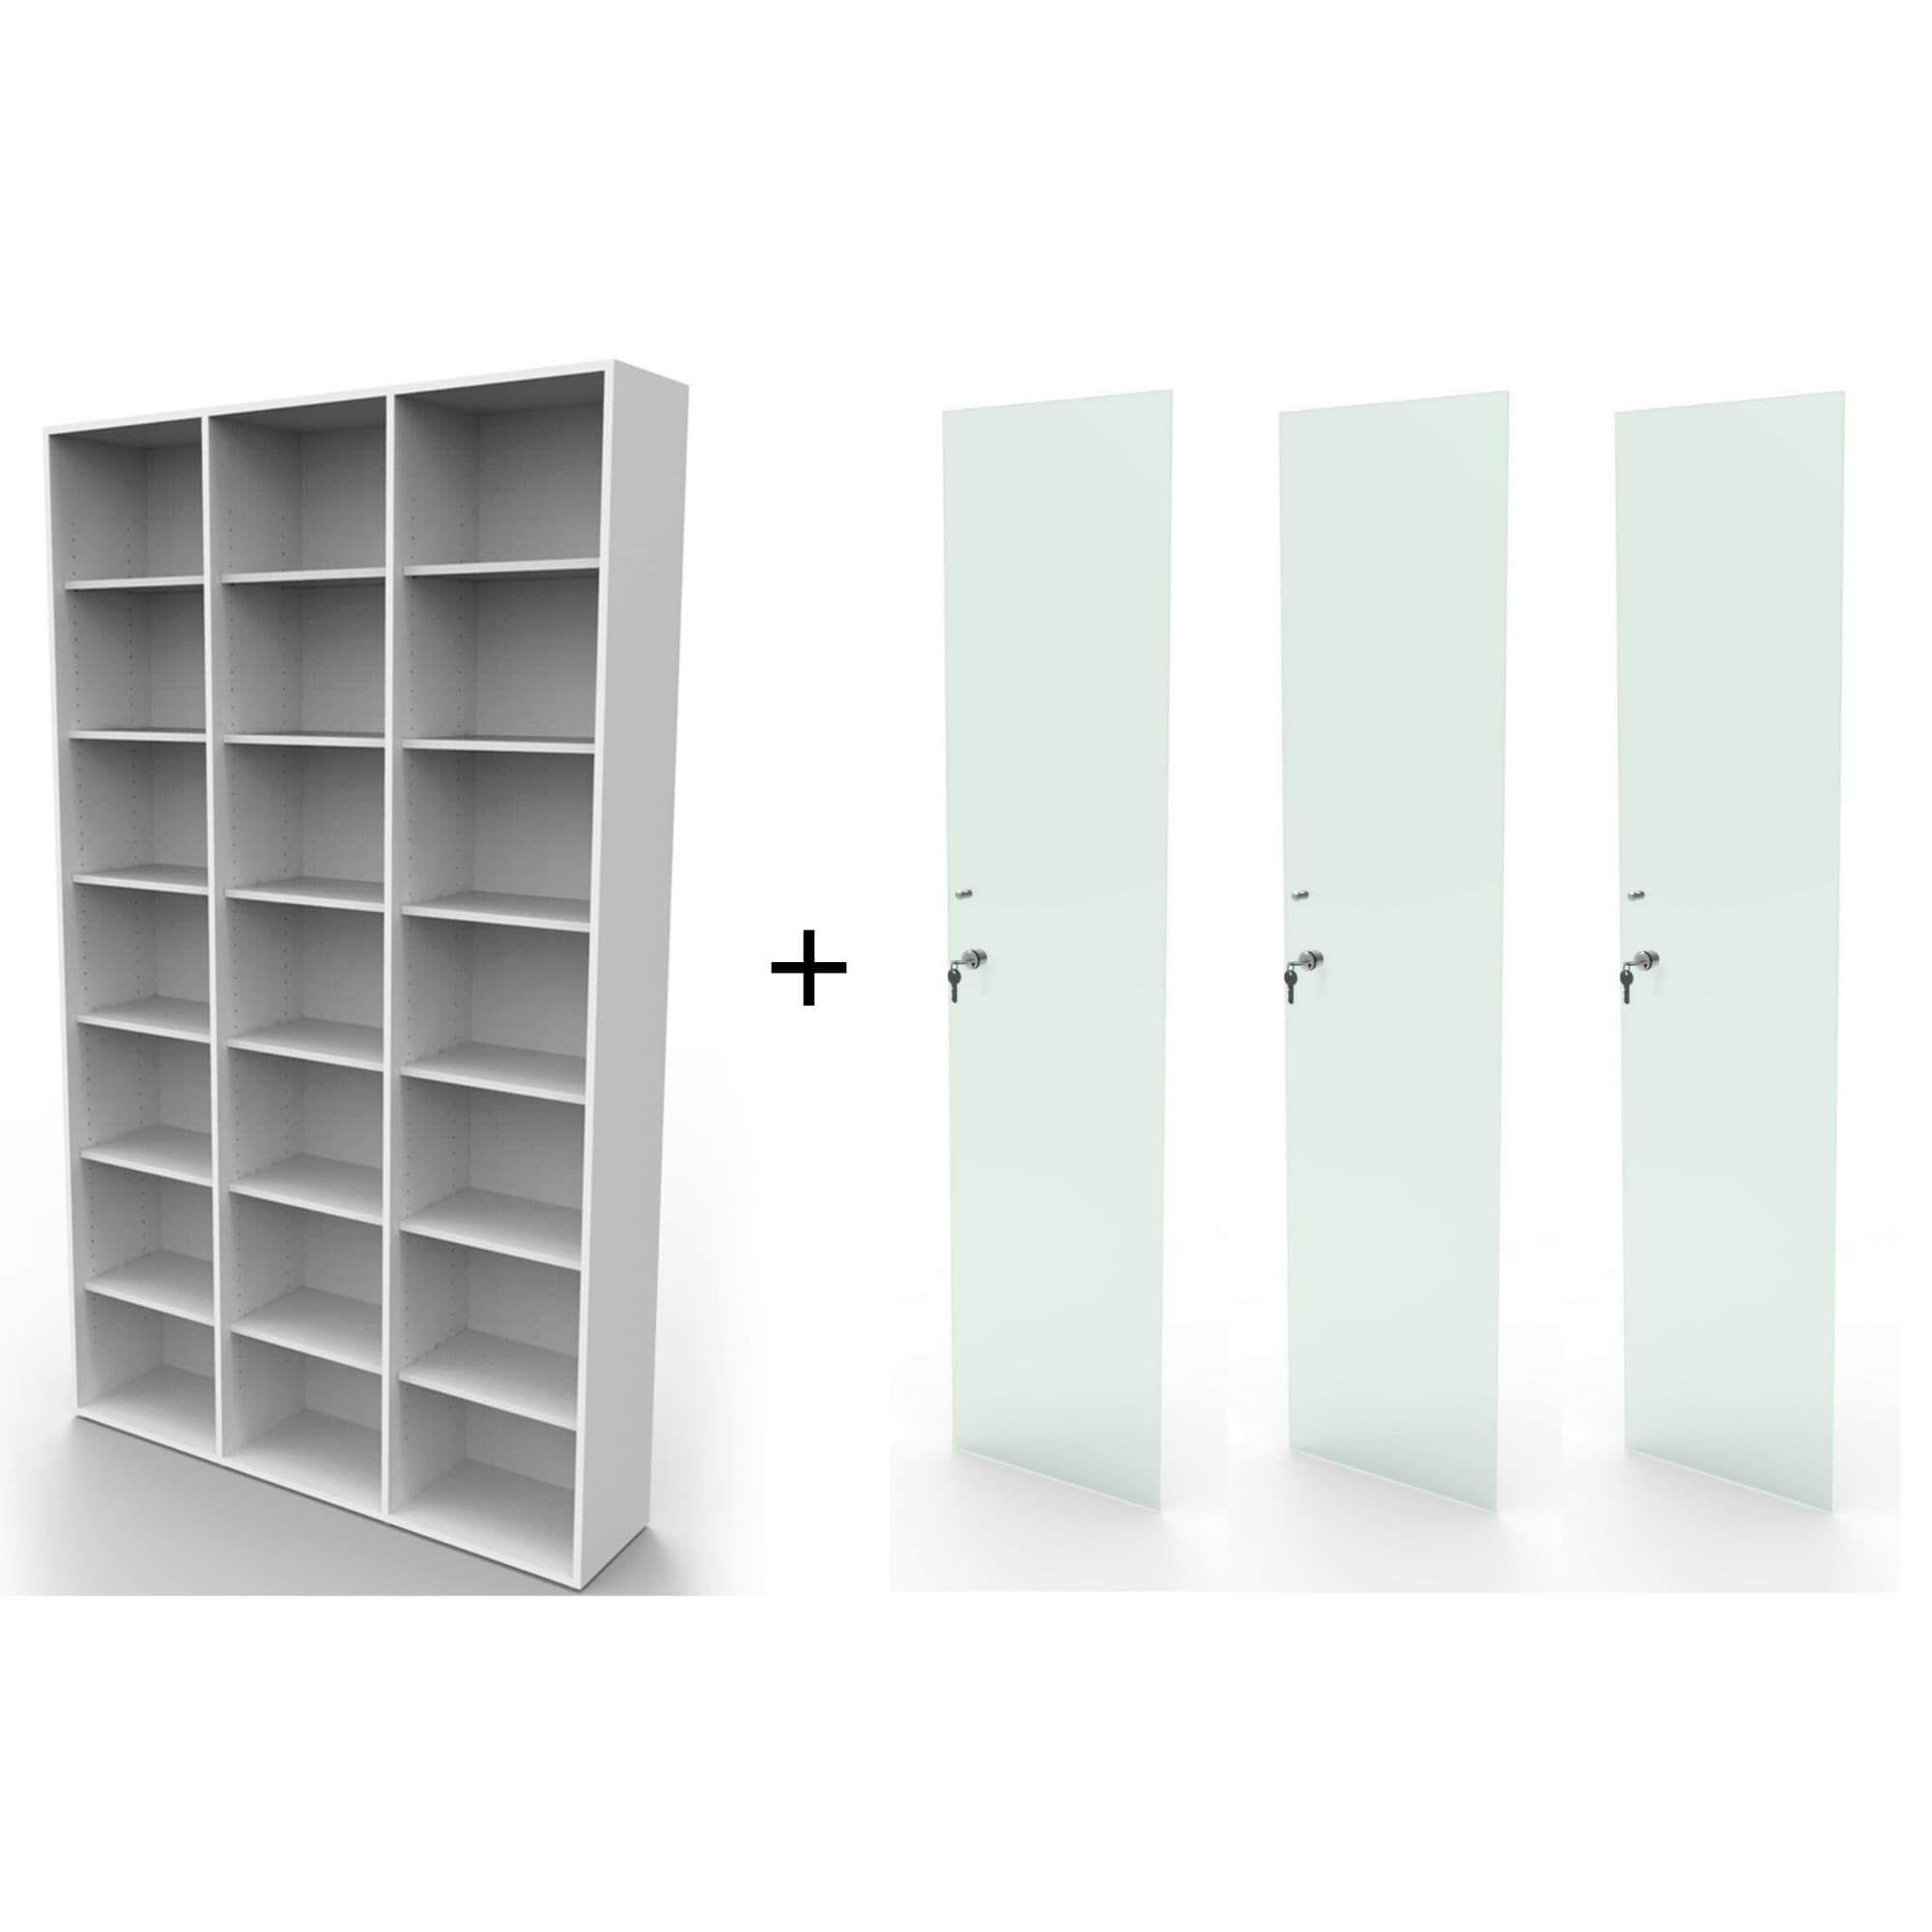 Estante biblioteca bookcase branca BK03BR com porta de vidro Bürohaus